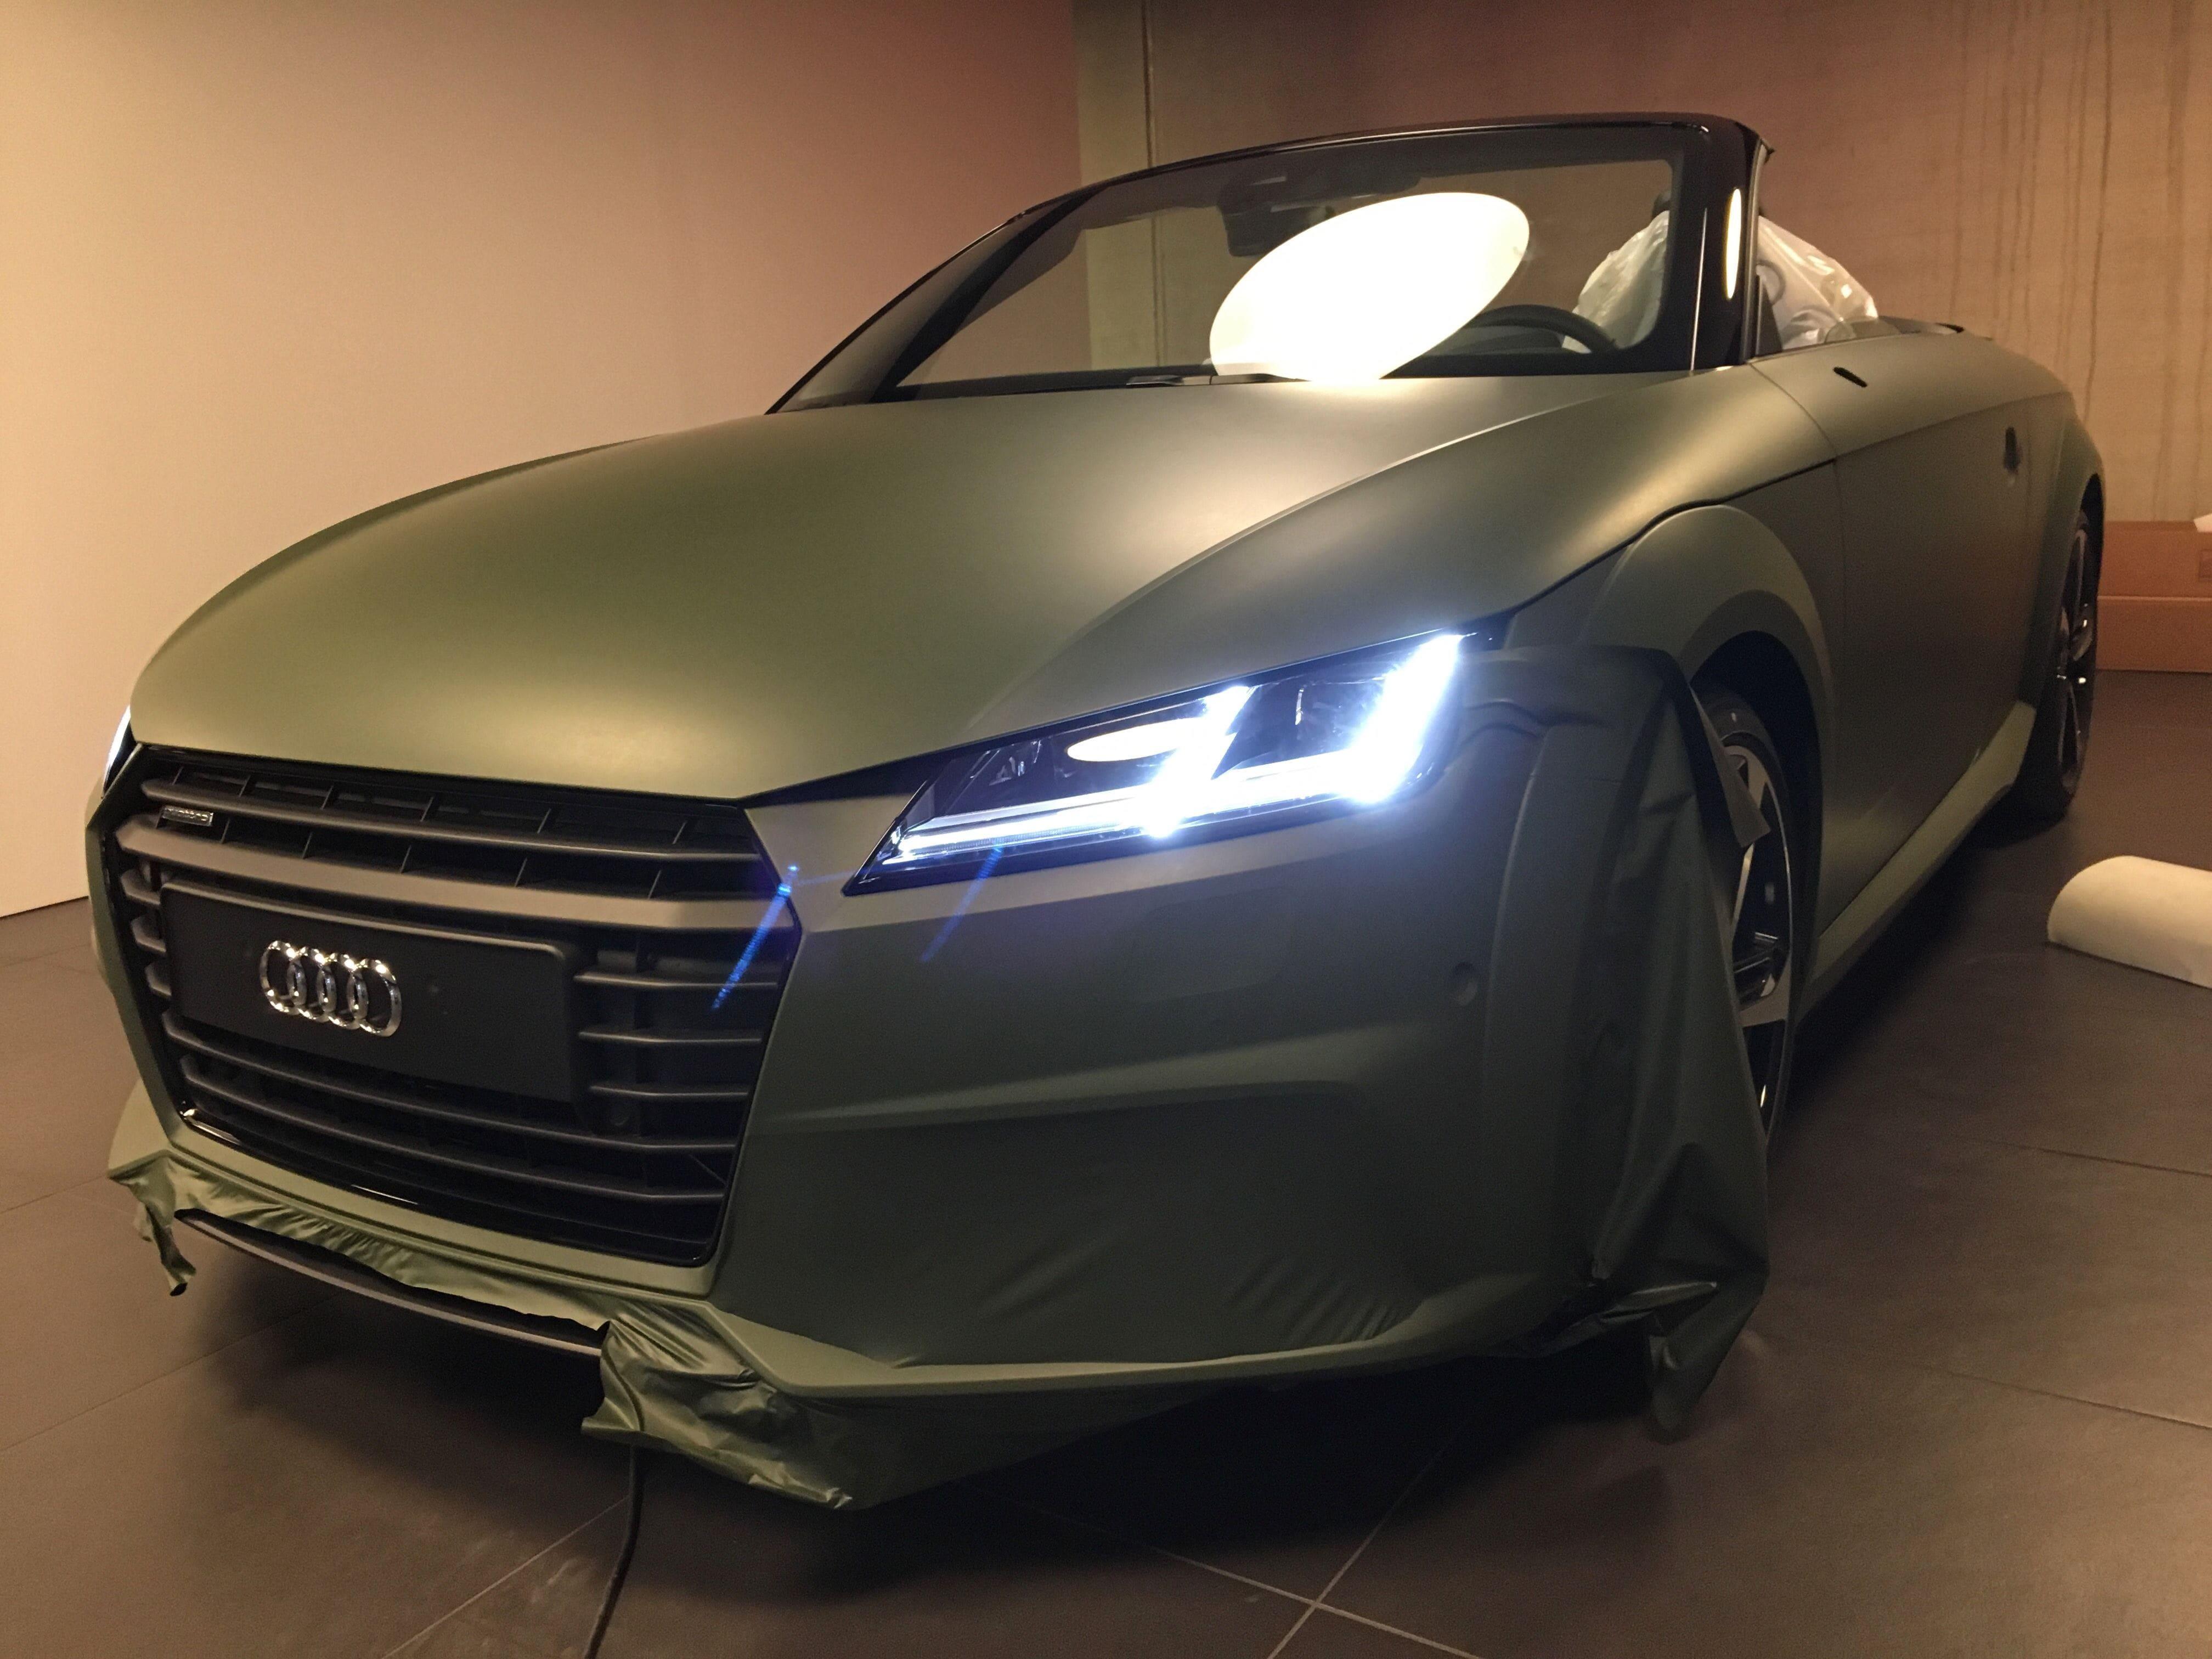 audi TT 2017 matte military green, Carwrapping door Wrapmyride.nu Foto-nr:9279, ©2020